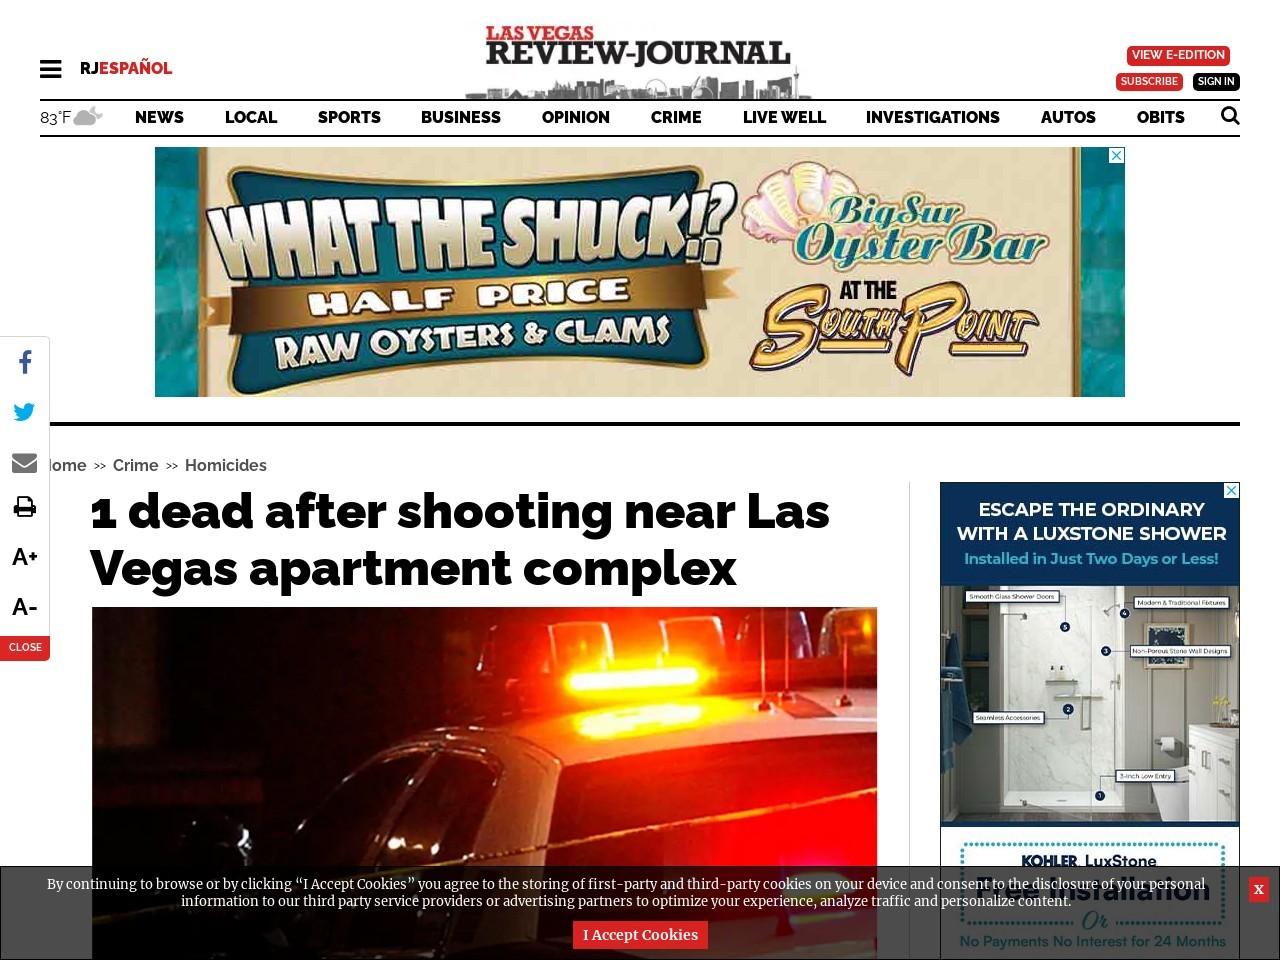 1 dead after shooting near Las Vegas apartment complex